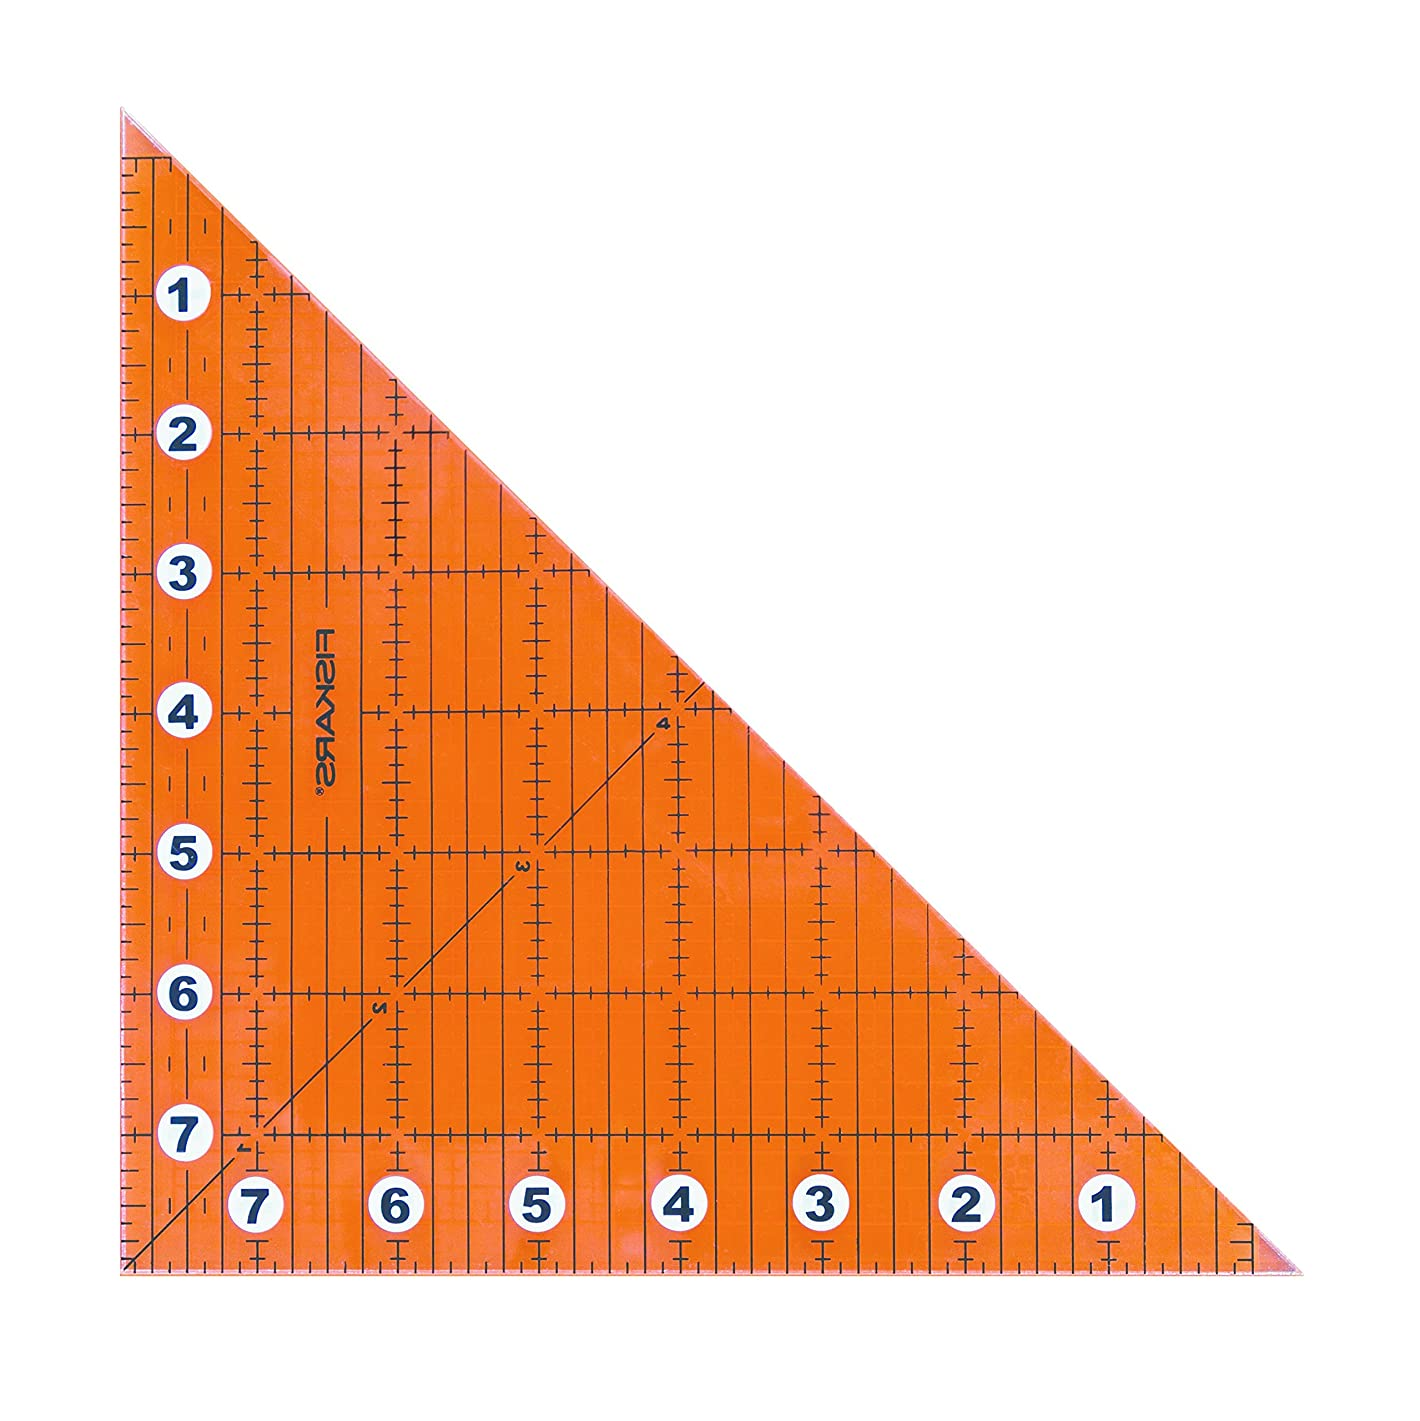 Fiskars Ruler Acrylic Folding Square, Clear, 8 x 8-Inch